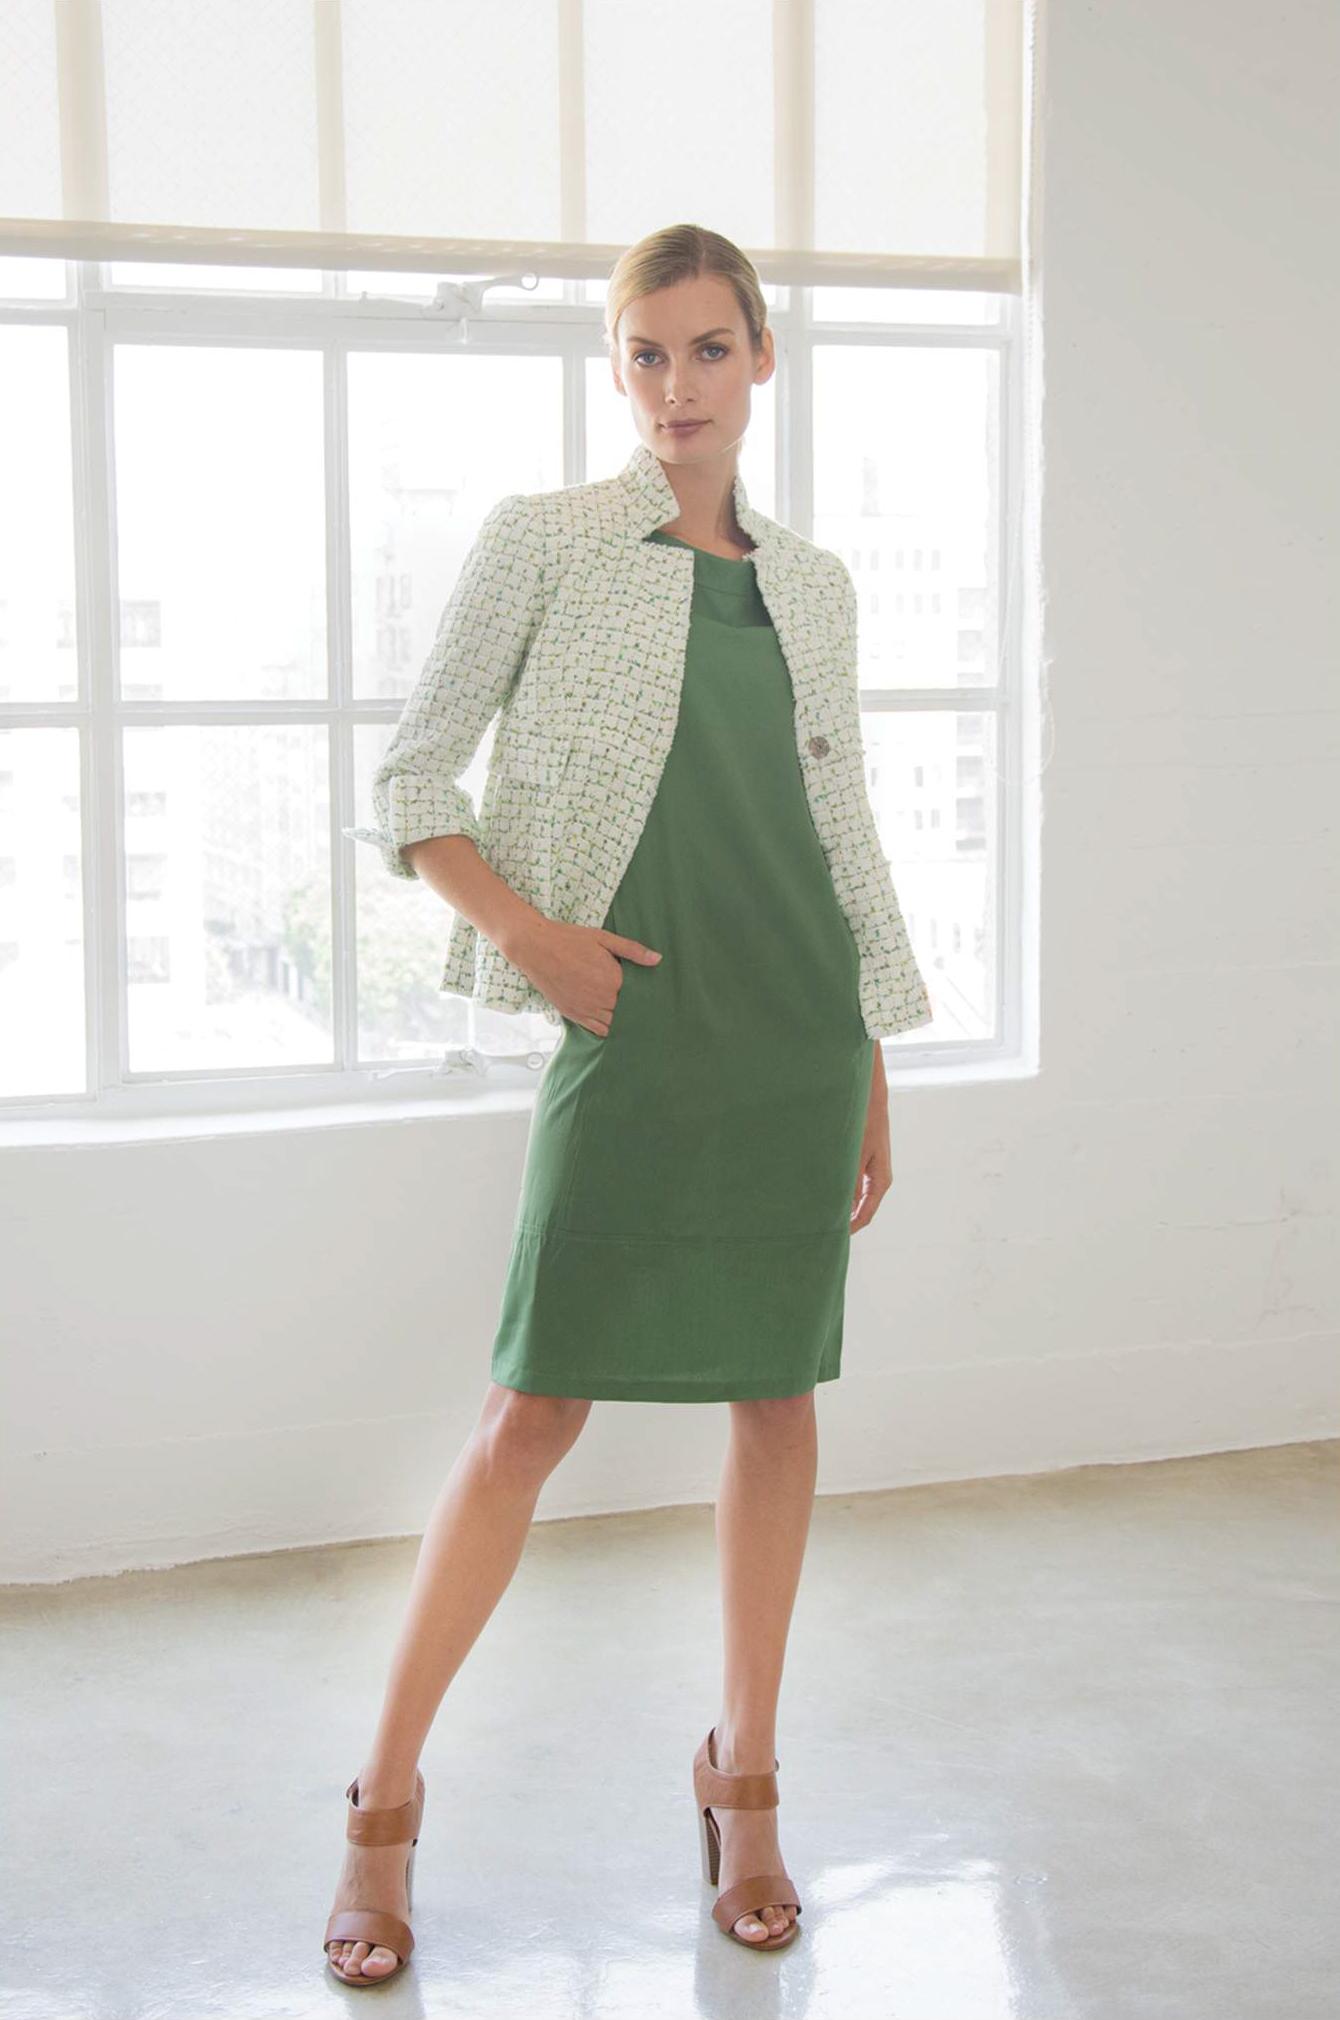 Jacket: Kendra 2, Dress: Lynn - SANTORELLI